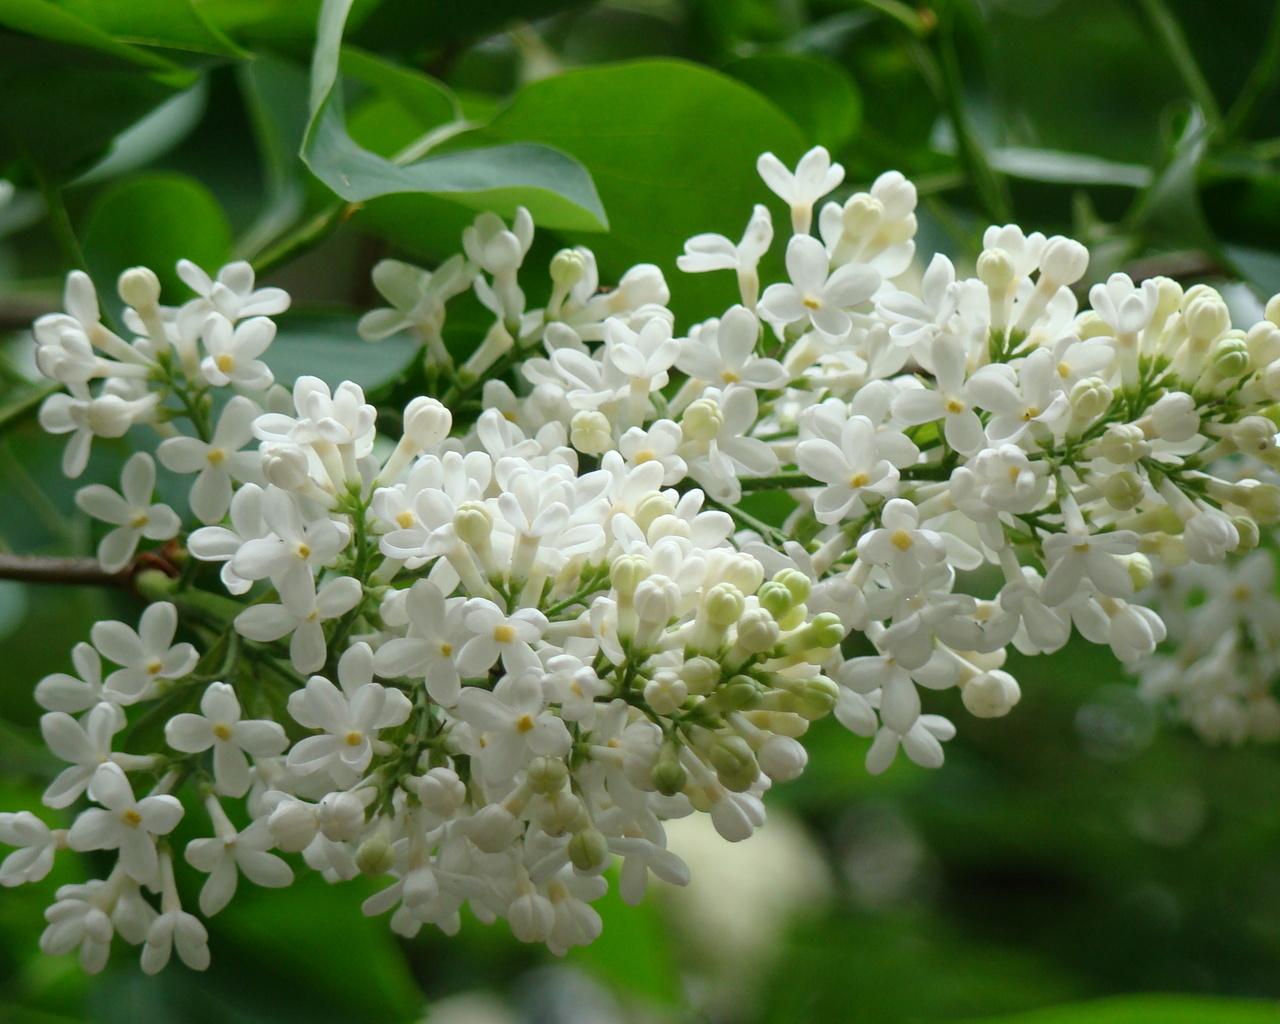 Imagini cu flori de primavara | Photoblog